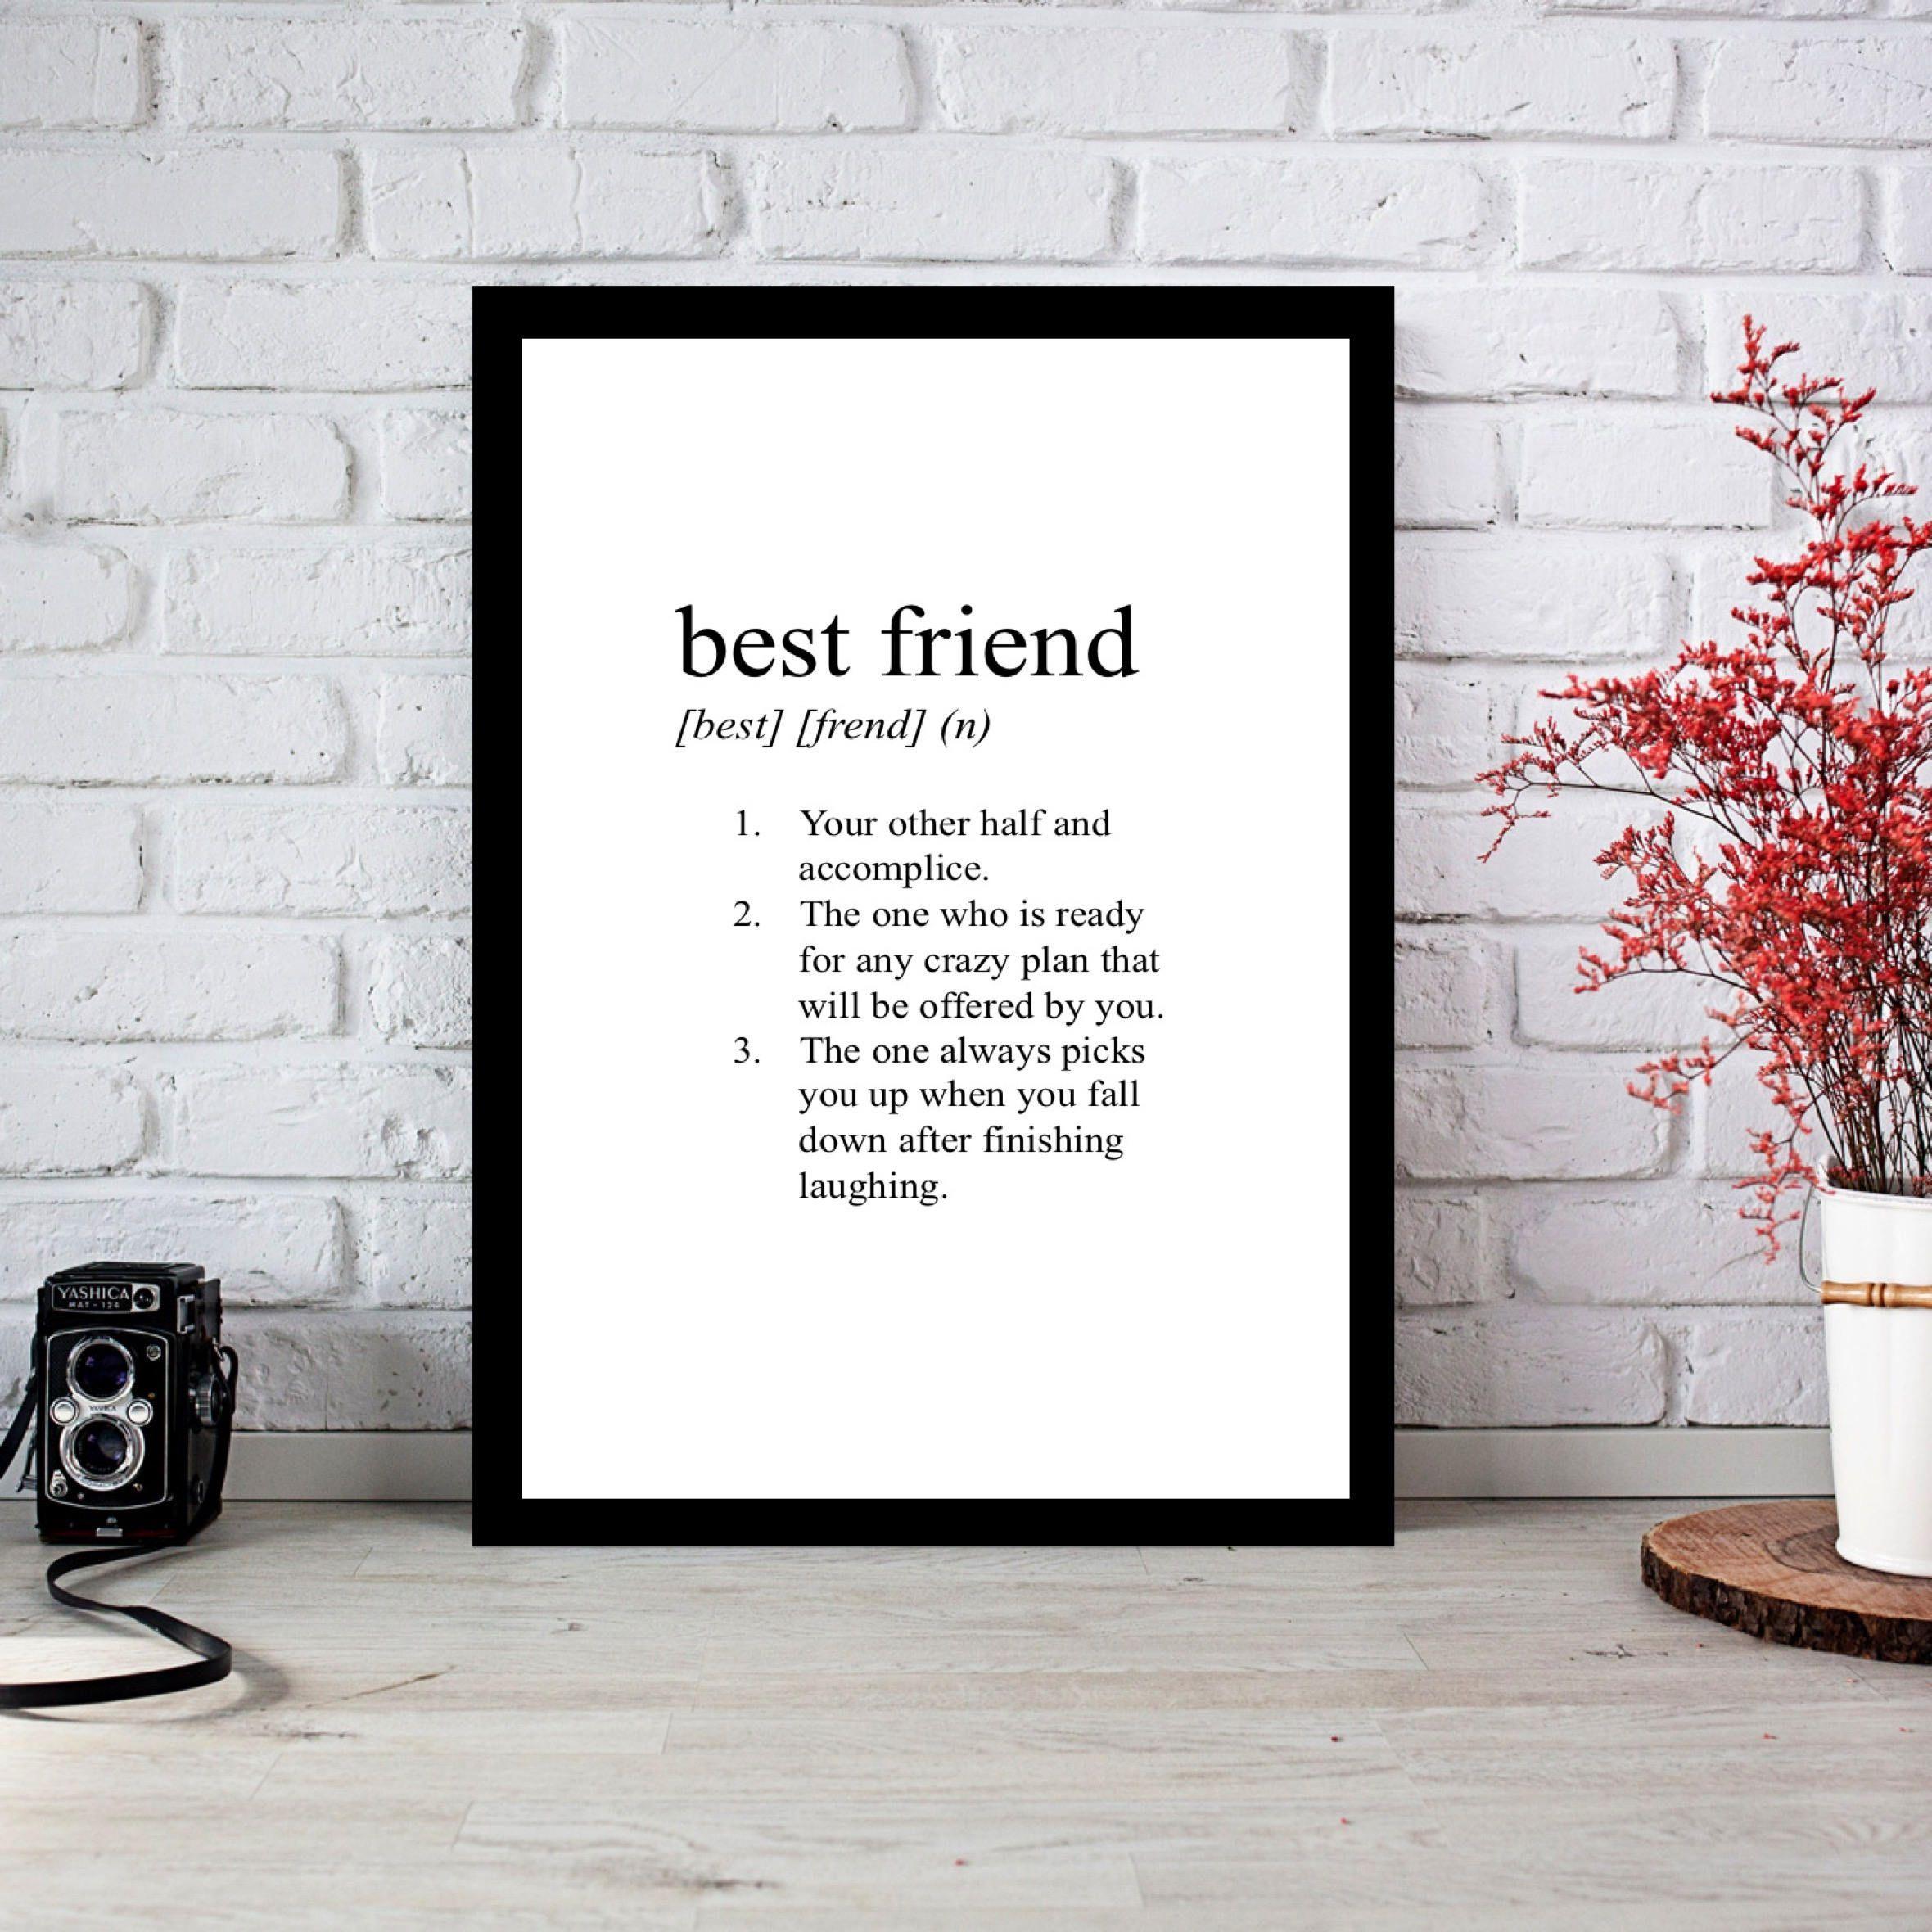 15 Best Friend Christmas Gift Ideas